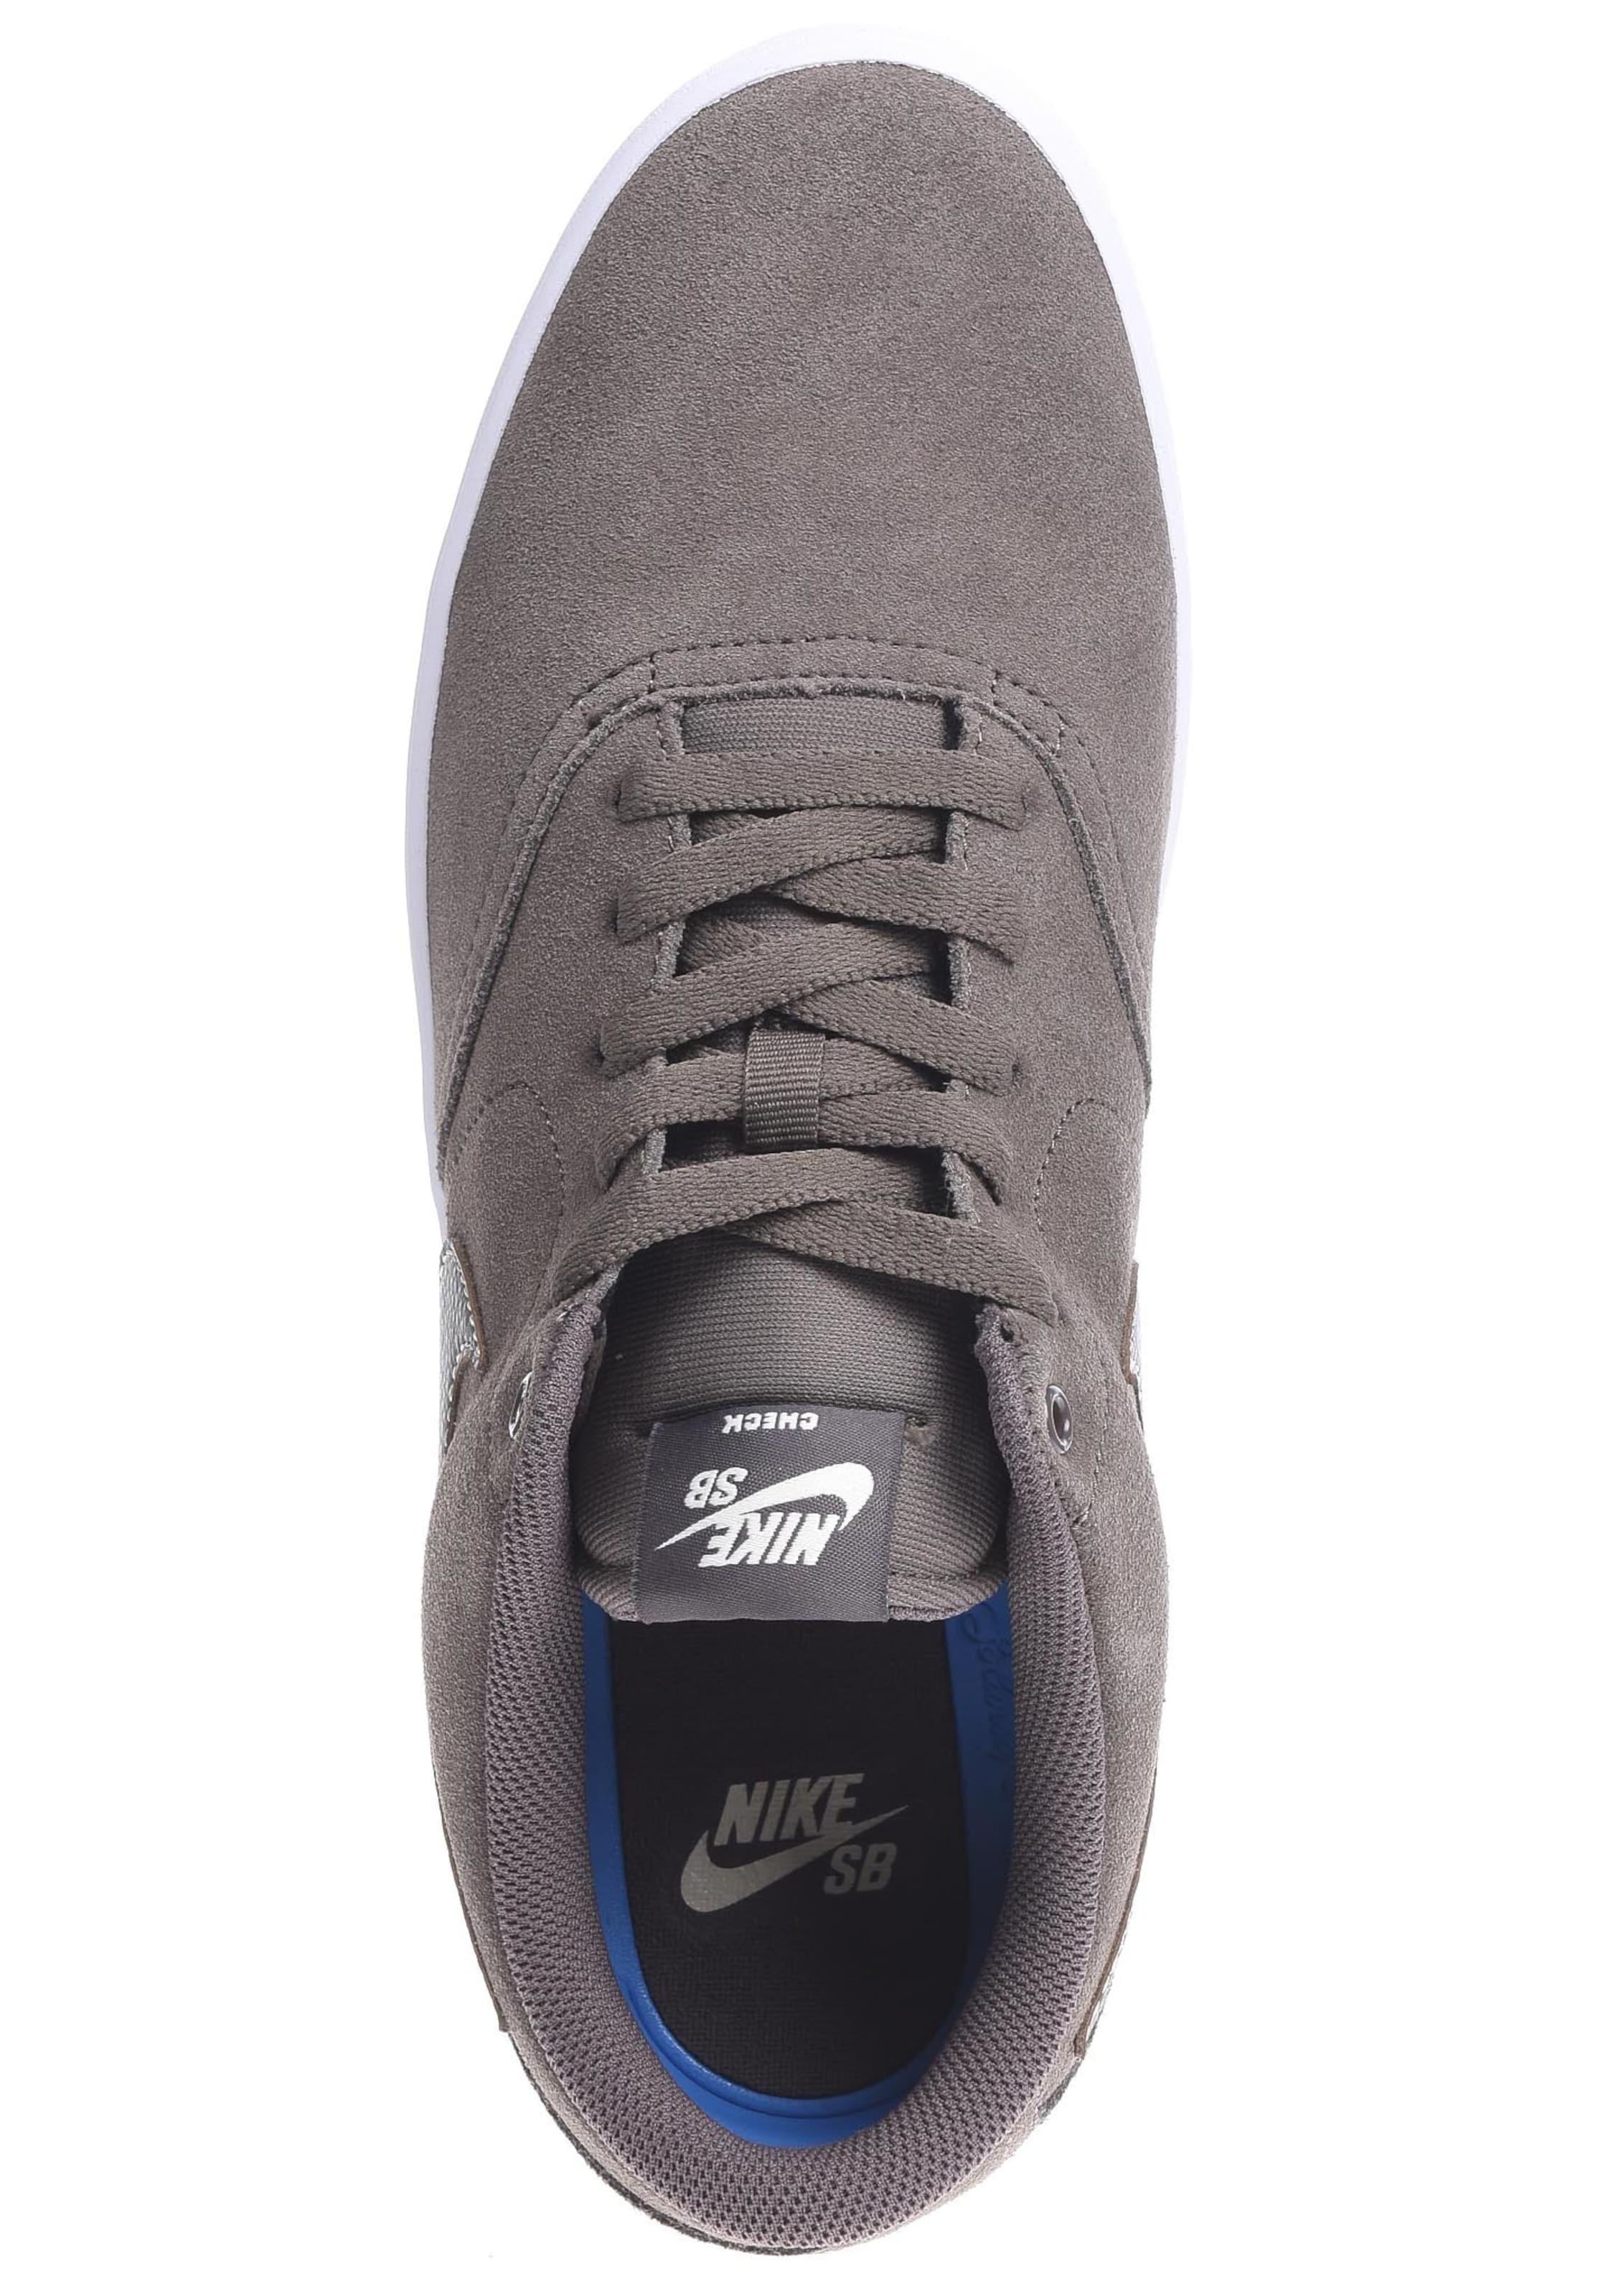 Sb Hellbraun In Nike Solar Check Sneaker P0XwOnN8kZ